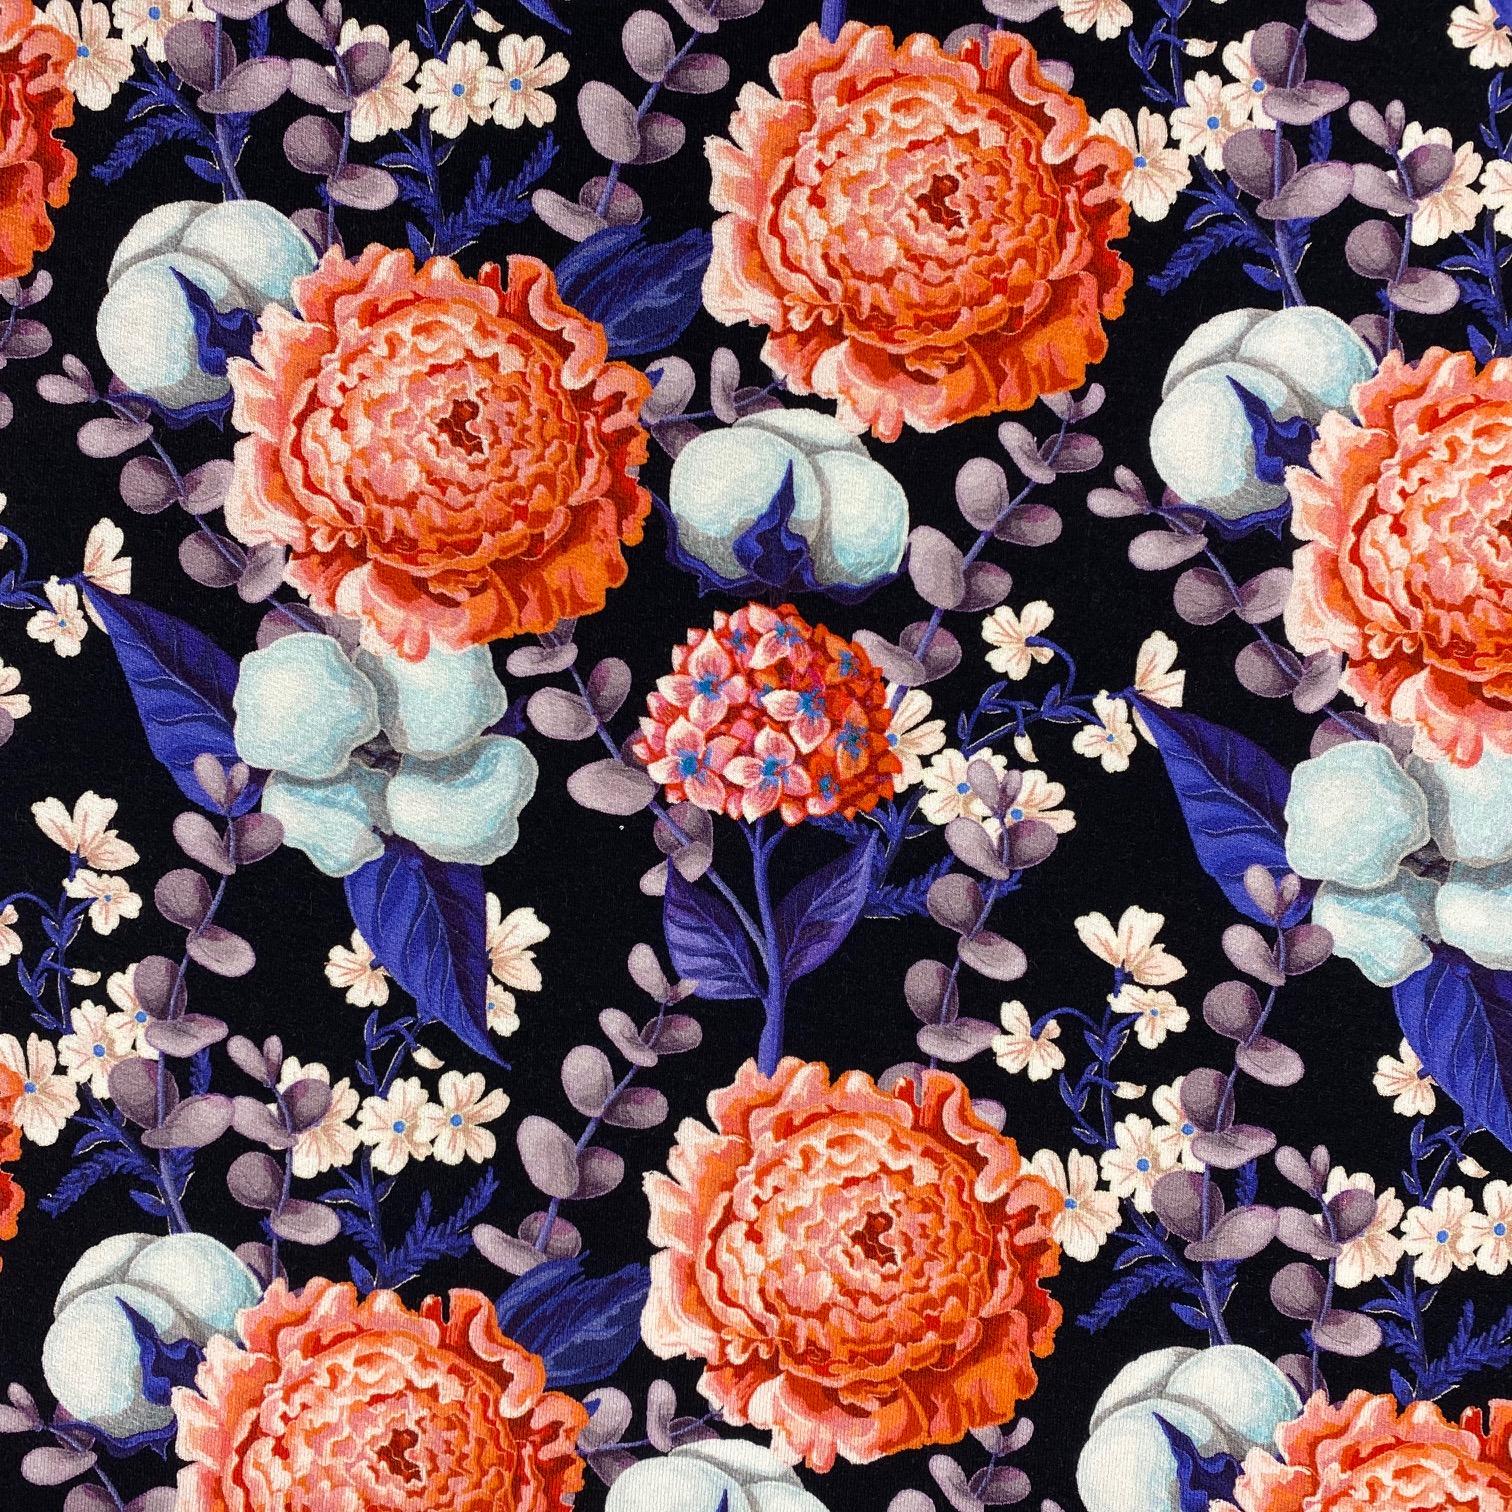 Viskosenjersey Crepe von FVJ, Blumen. Art. FVJ-2356